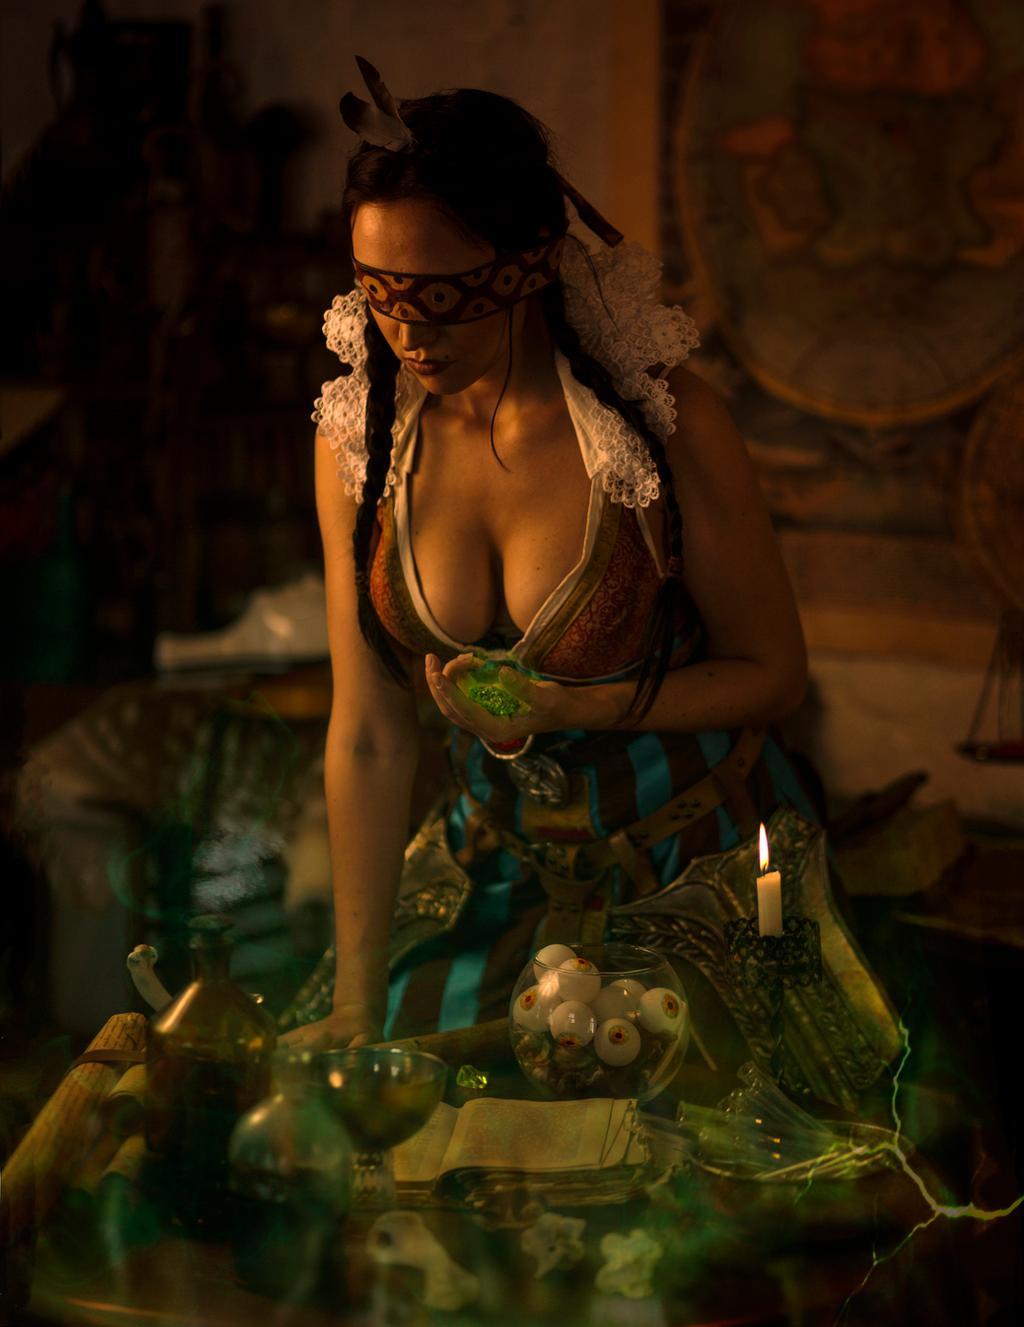 philippa_eilhart_the_witcher_3_cosplay_by_harridana_dd99h65-fullview.jpg - The Witcher 3: Wild Hunt